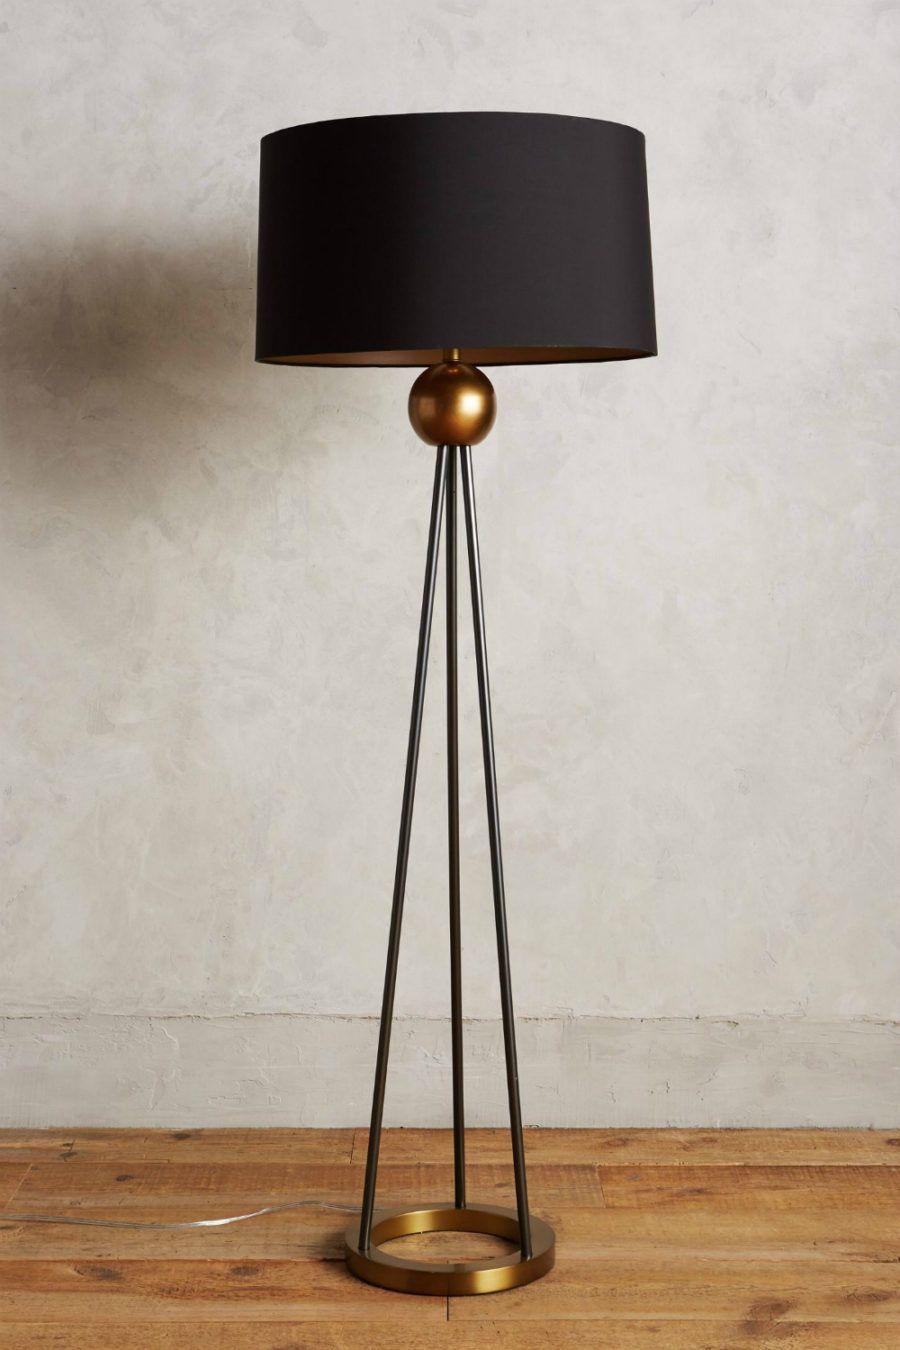 25 Absolutely Not Boring Tripod Floor Lamp Designs Beautiful Floor Lamps Unique Floor Lamps Tripod Floor Lamps